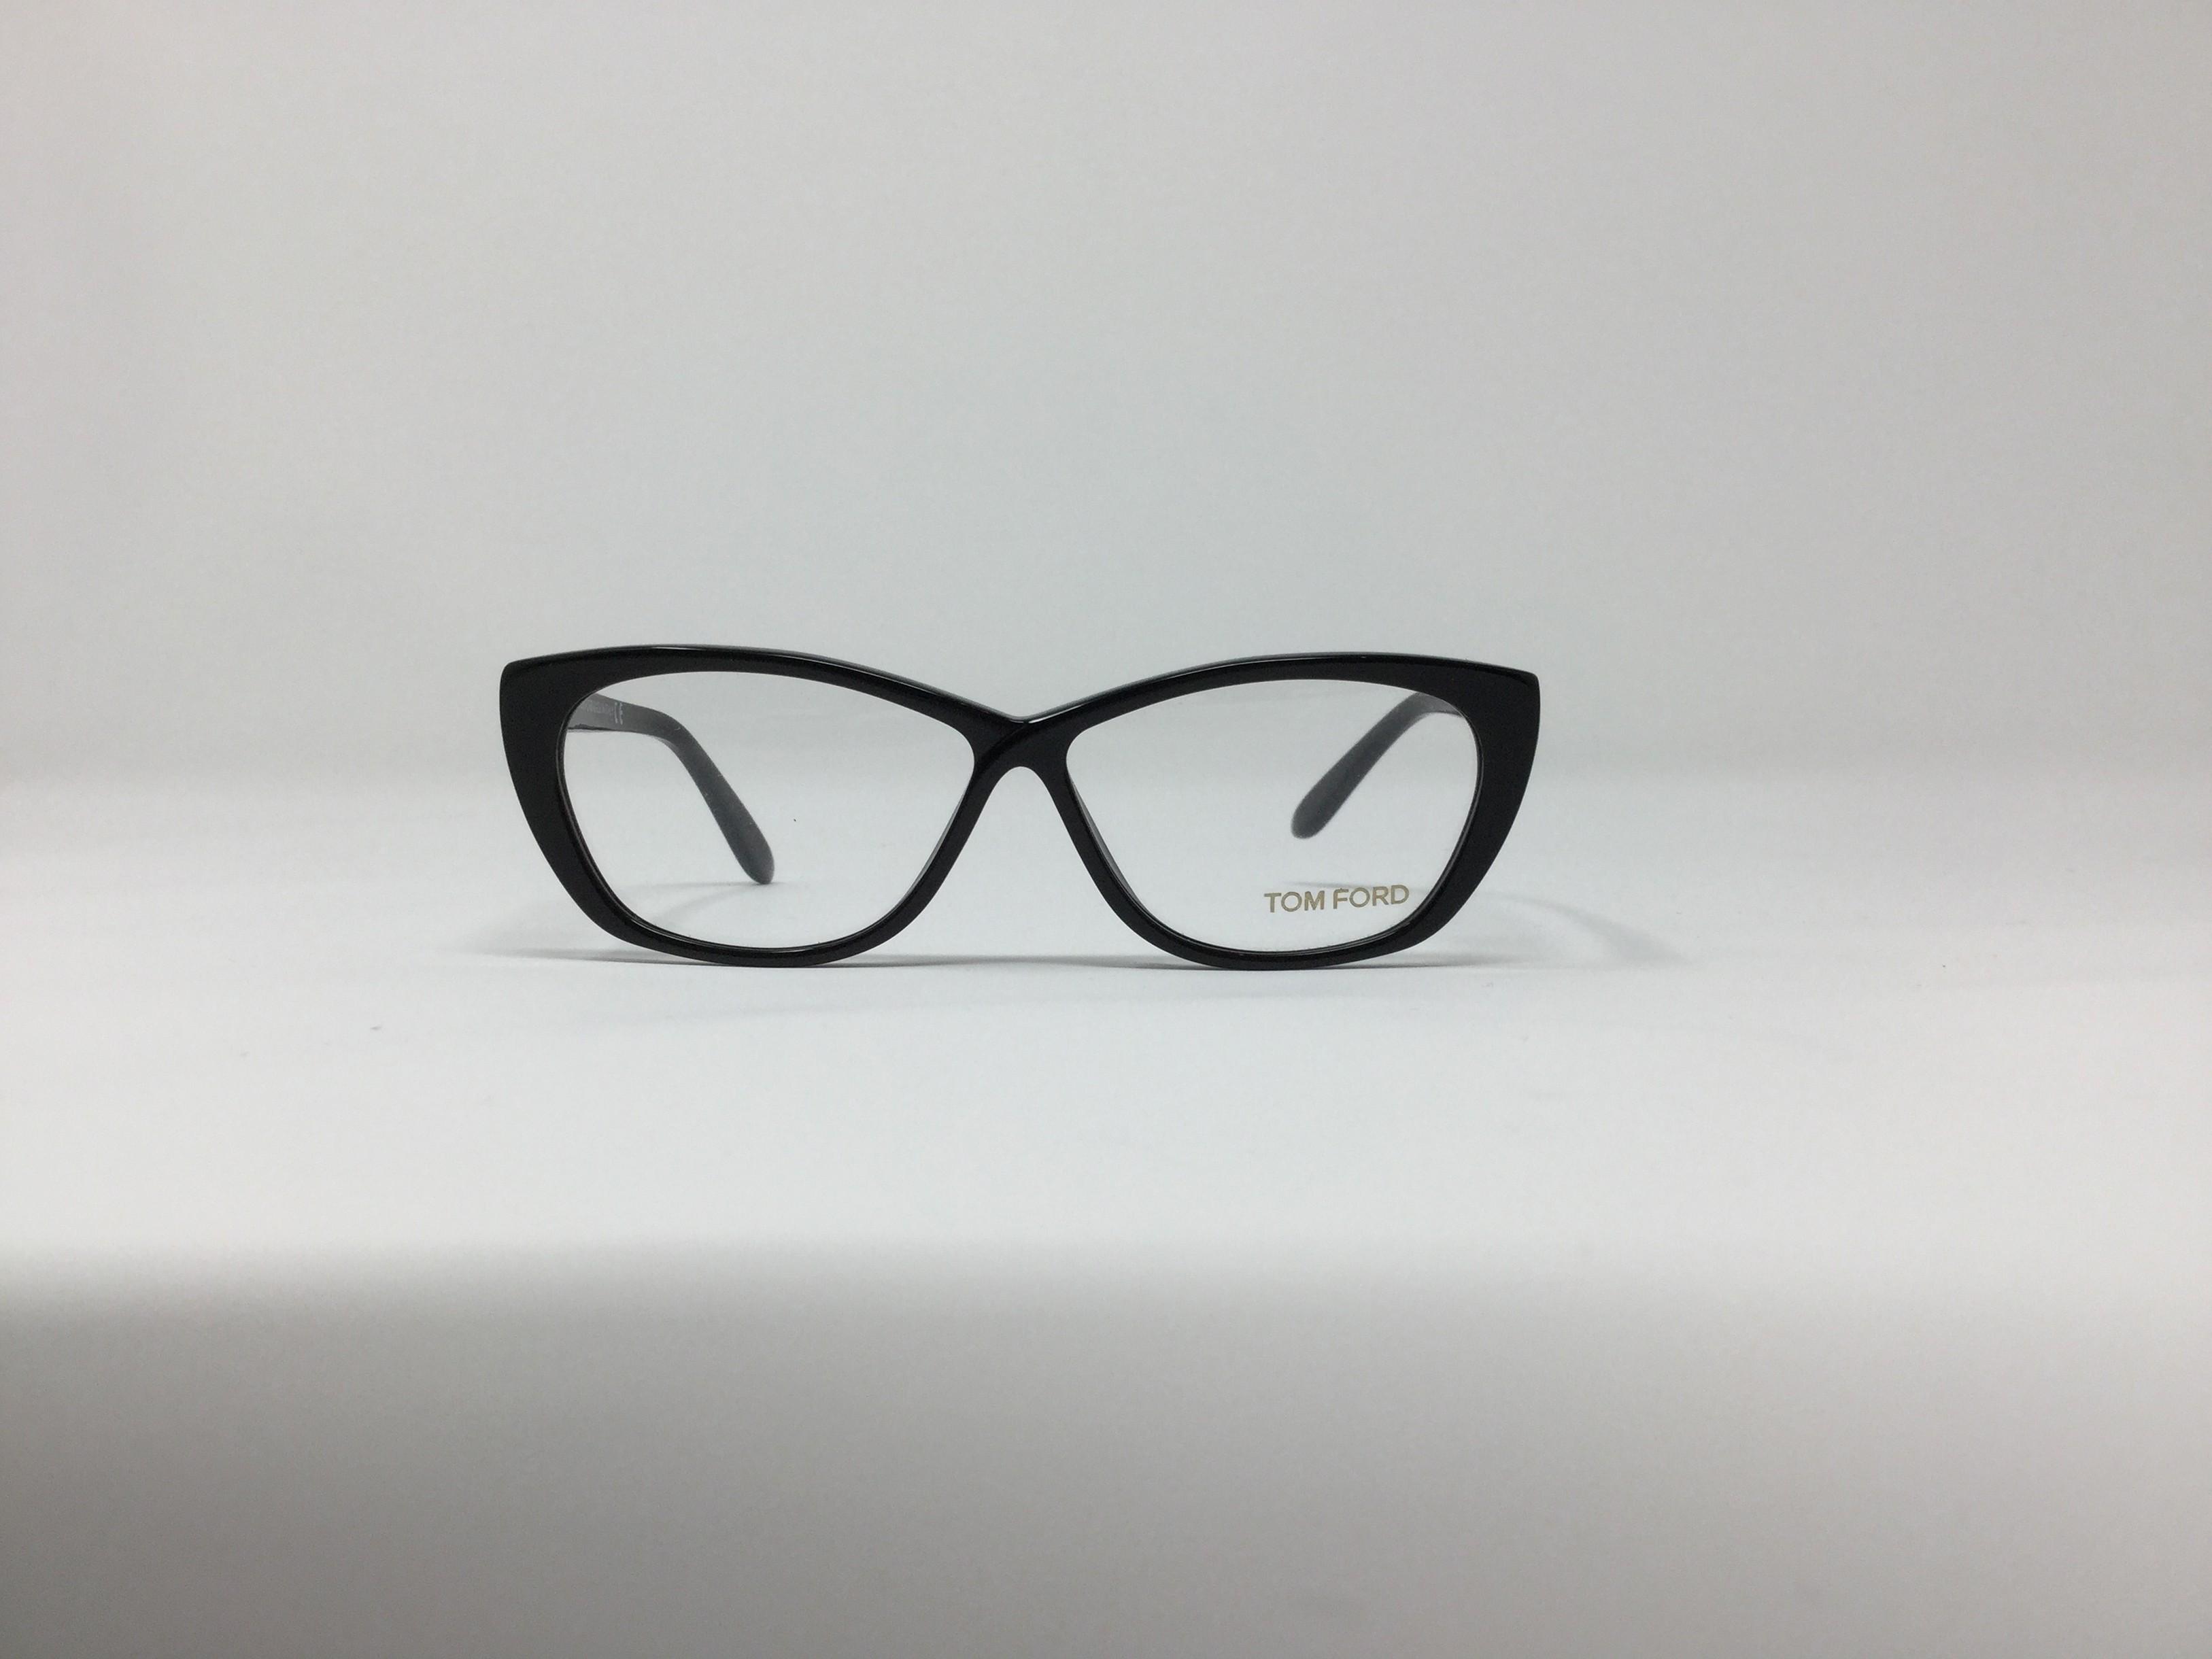 877e9e4d7f Tom Ford TF5227 Womens Eyeglasses - Women - Eyeglasses